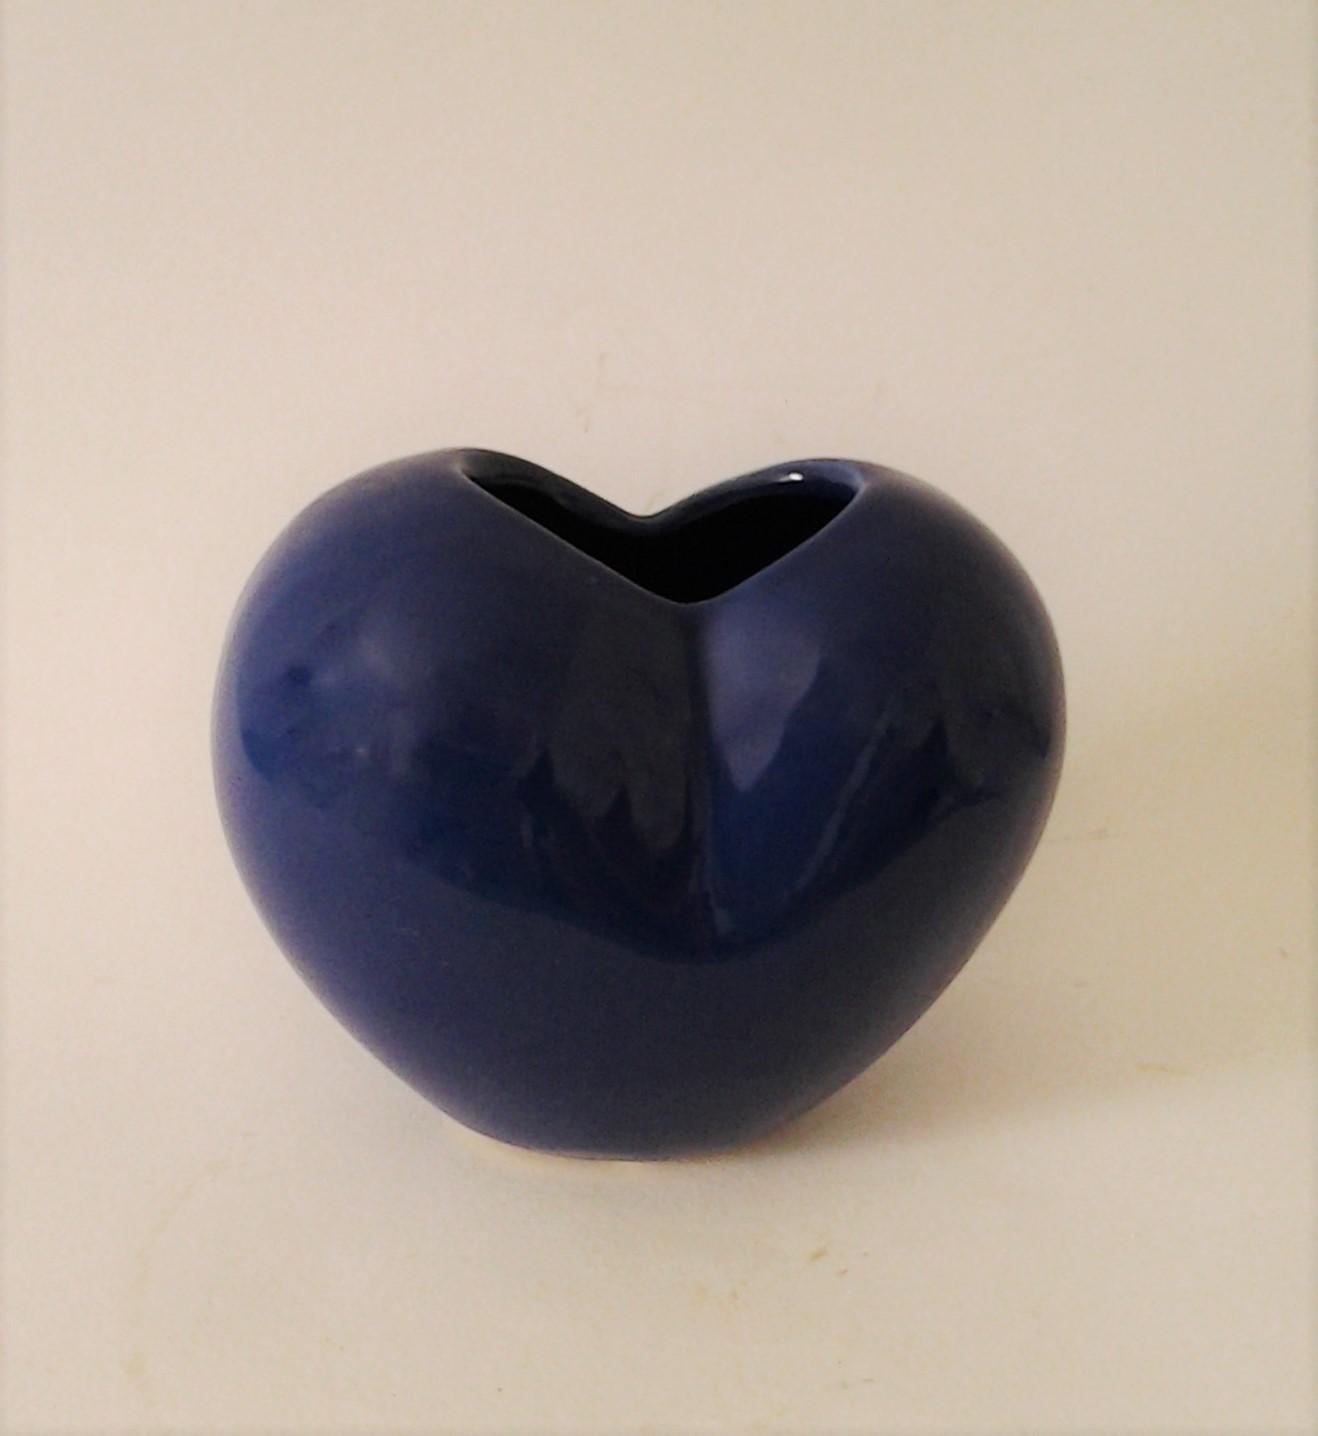 dekoračná váza srdiečko modré 13 x 7 10 cm